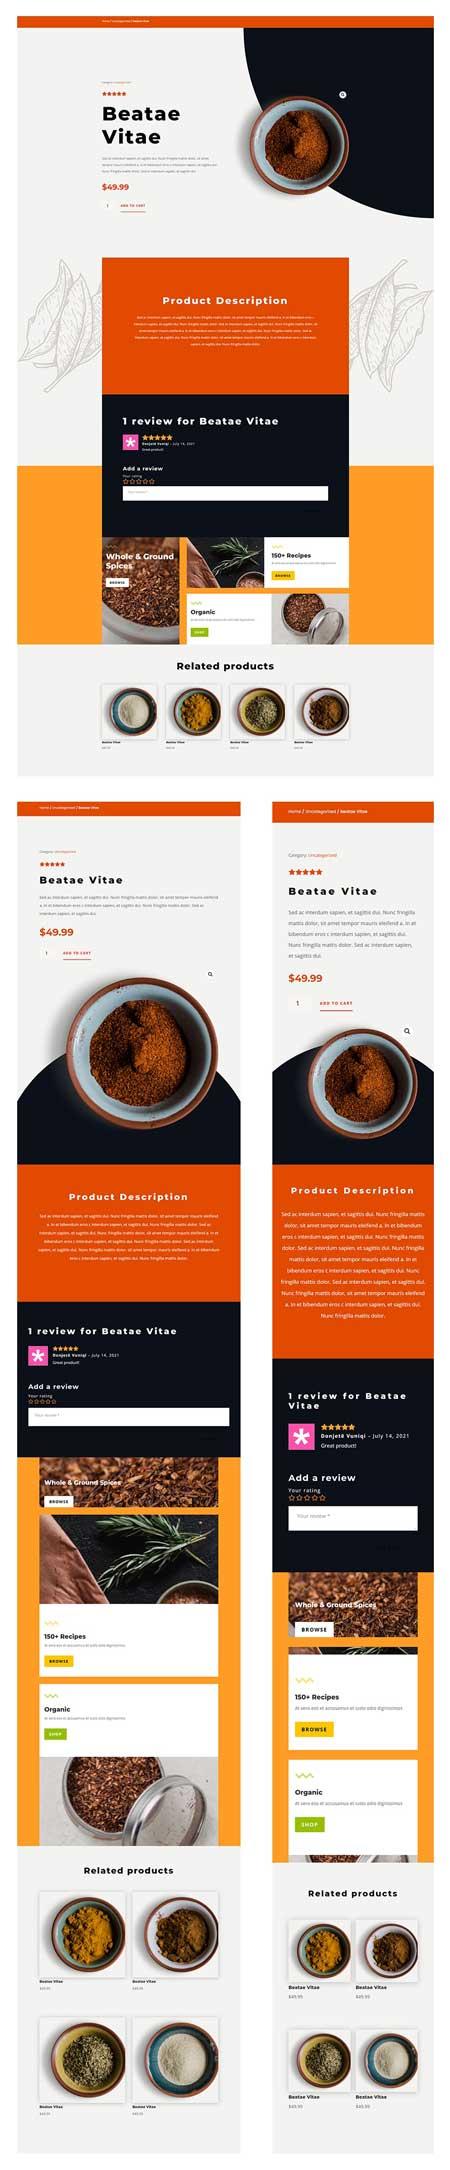 Divi Spice Shop Product Page Template